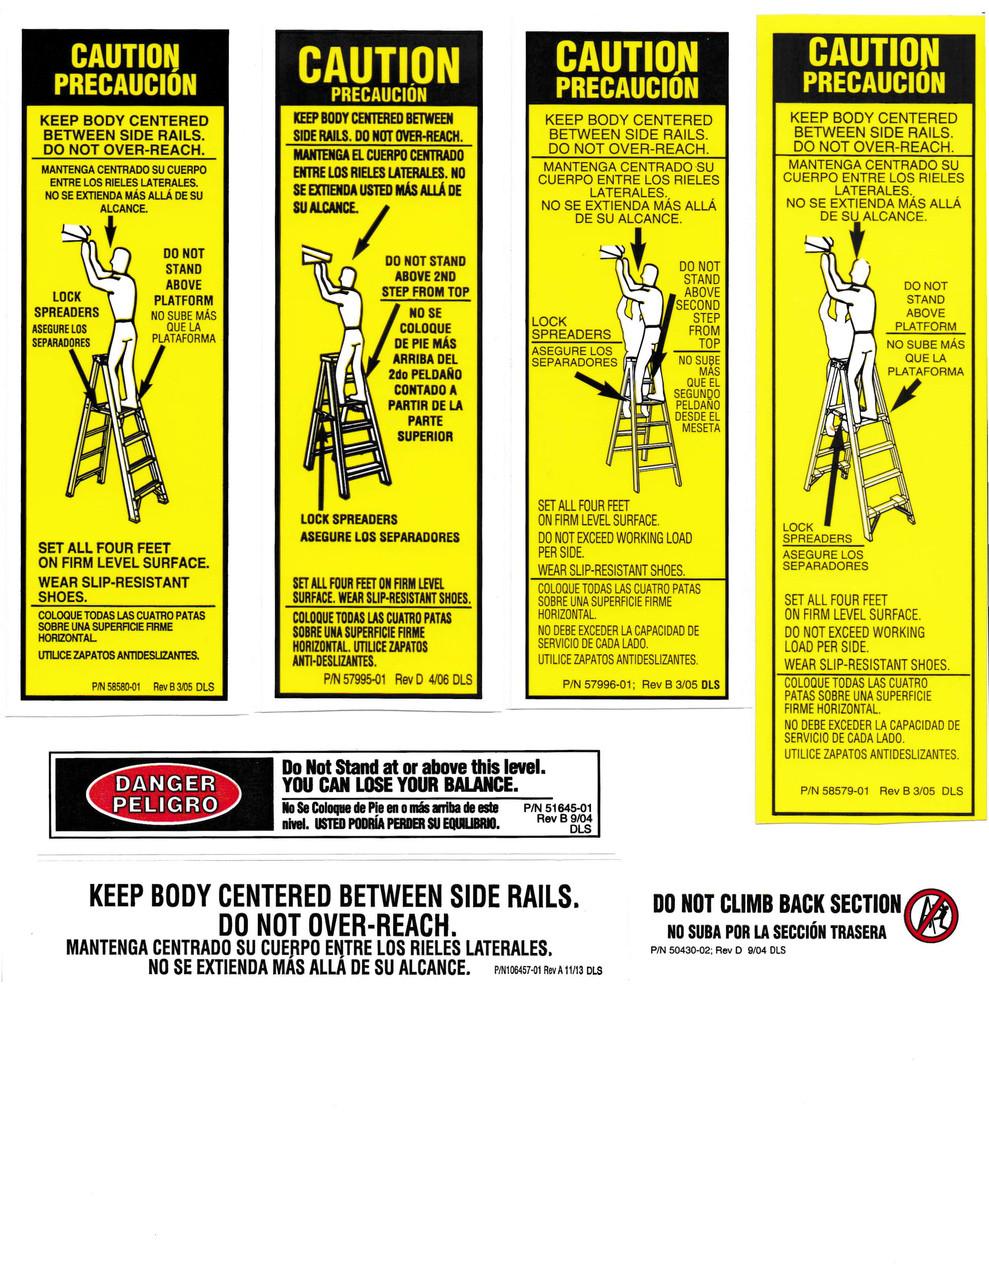 Werner Las100 Safety Labels Aluminum Step Ladders Industrial